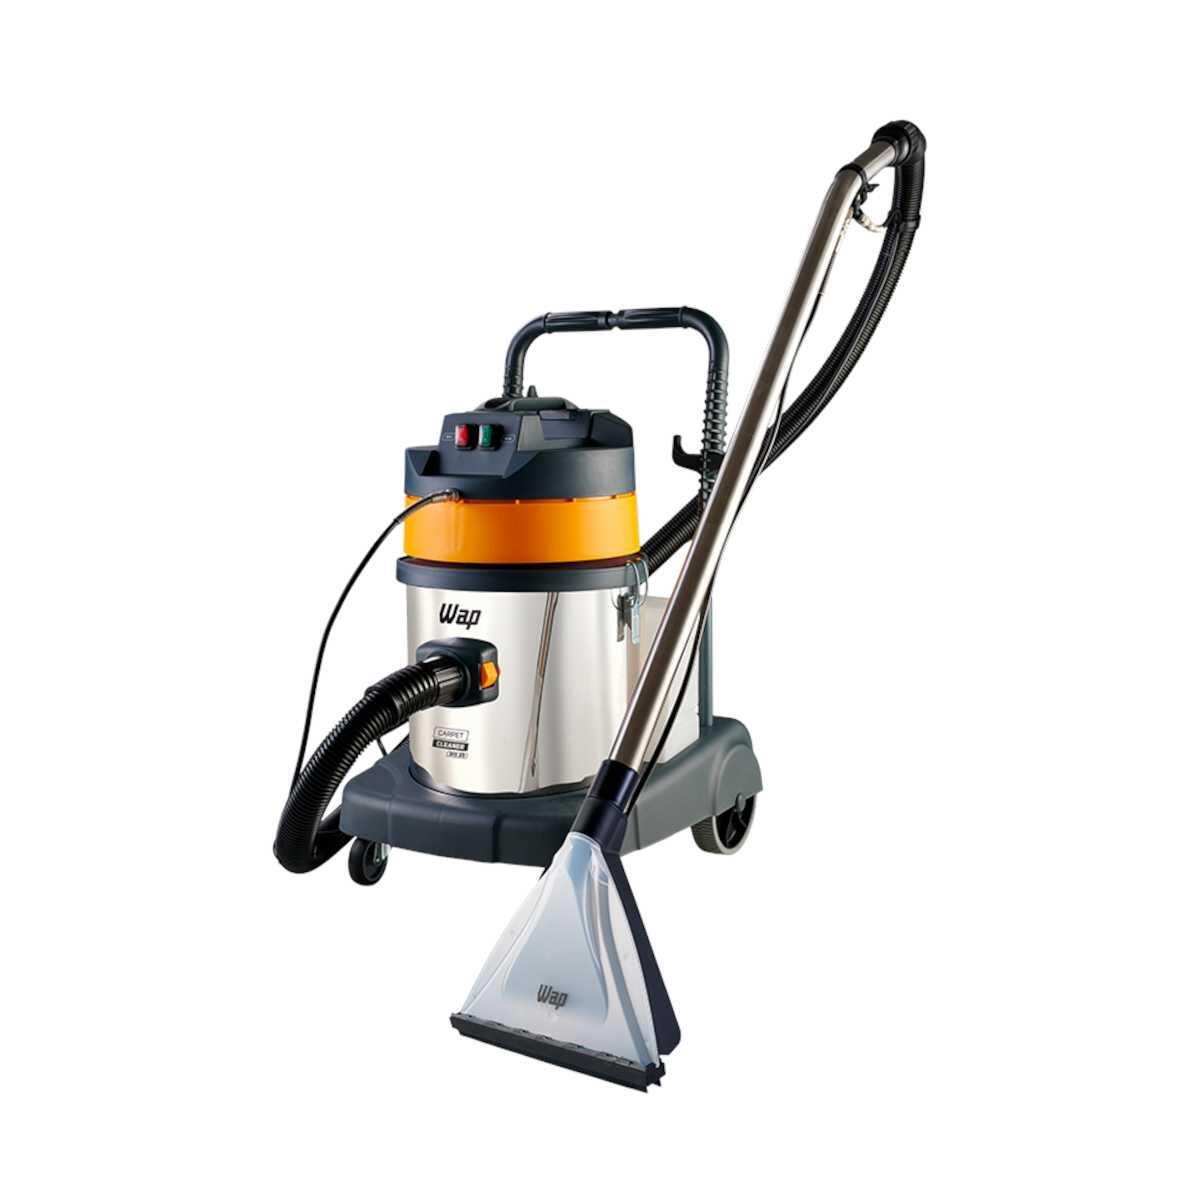 Extratora 160W 27L Carpet Cleaner Pro35 Wap 127V